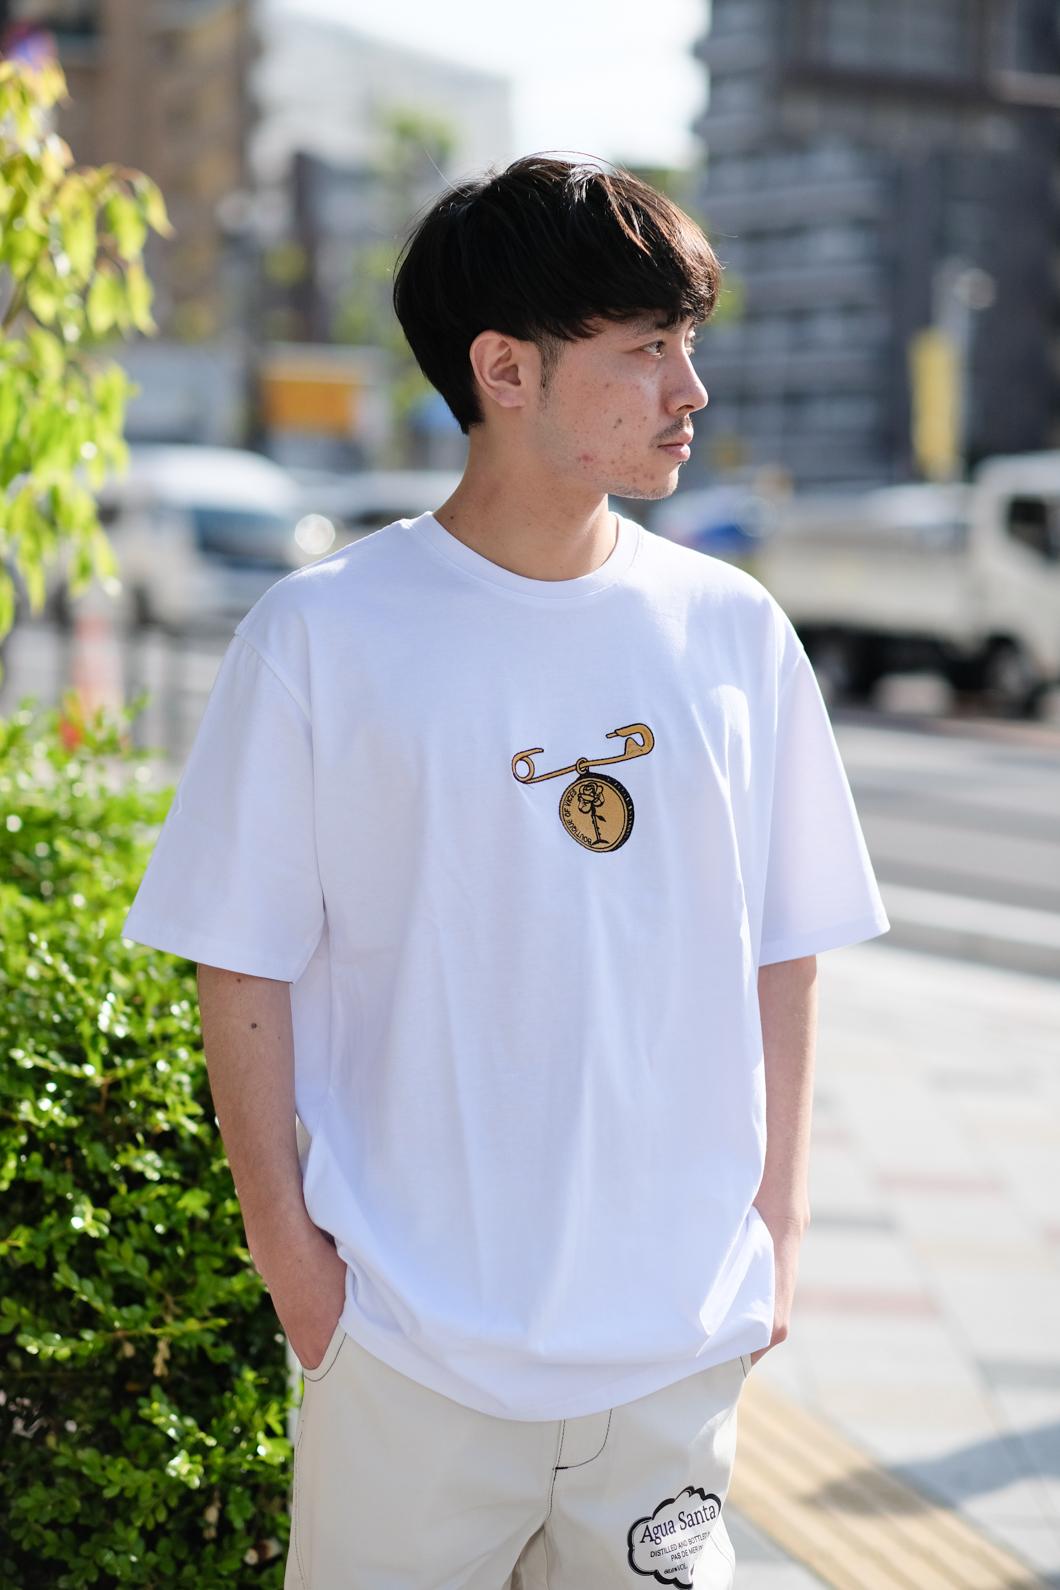 【PAS DE MER/パドゥメ】MEDALS T-SHIRT Tシャツ / WHITE